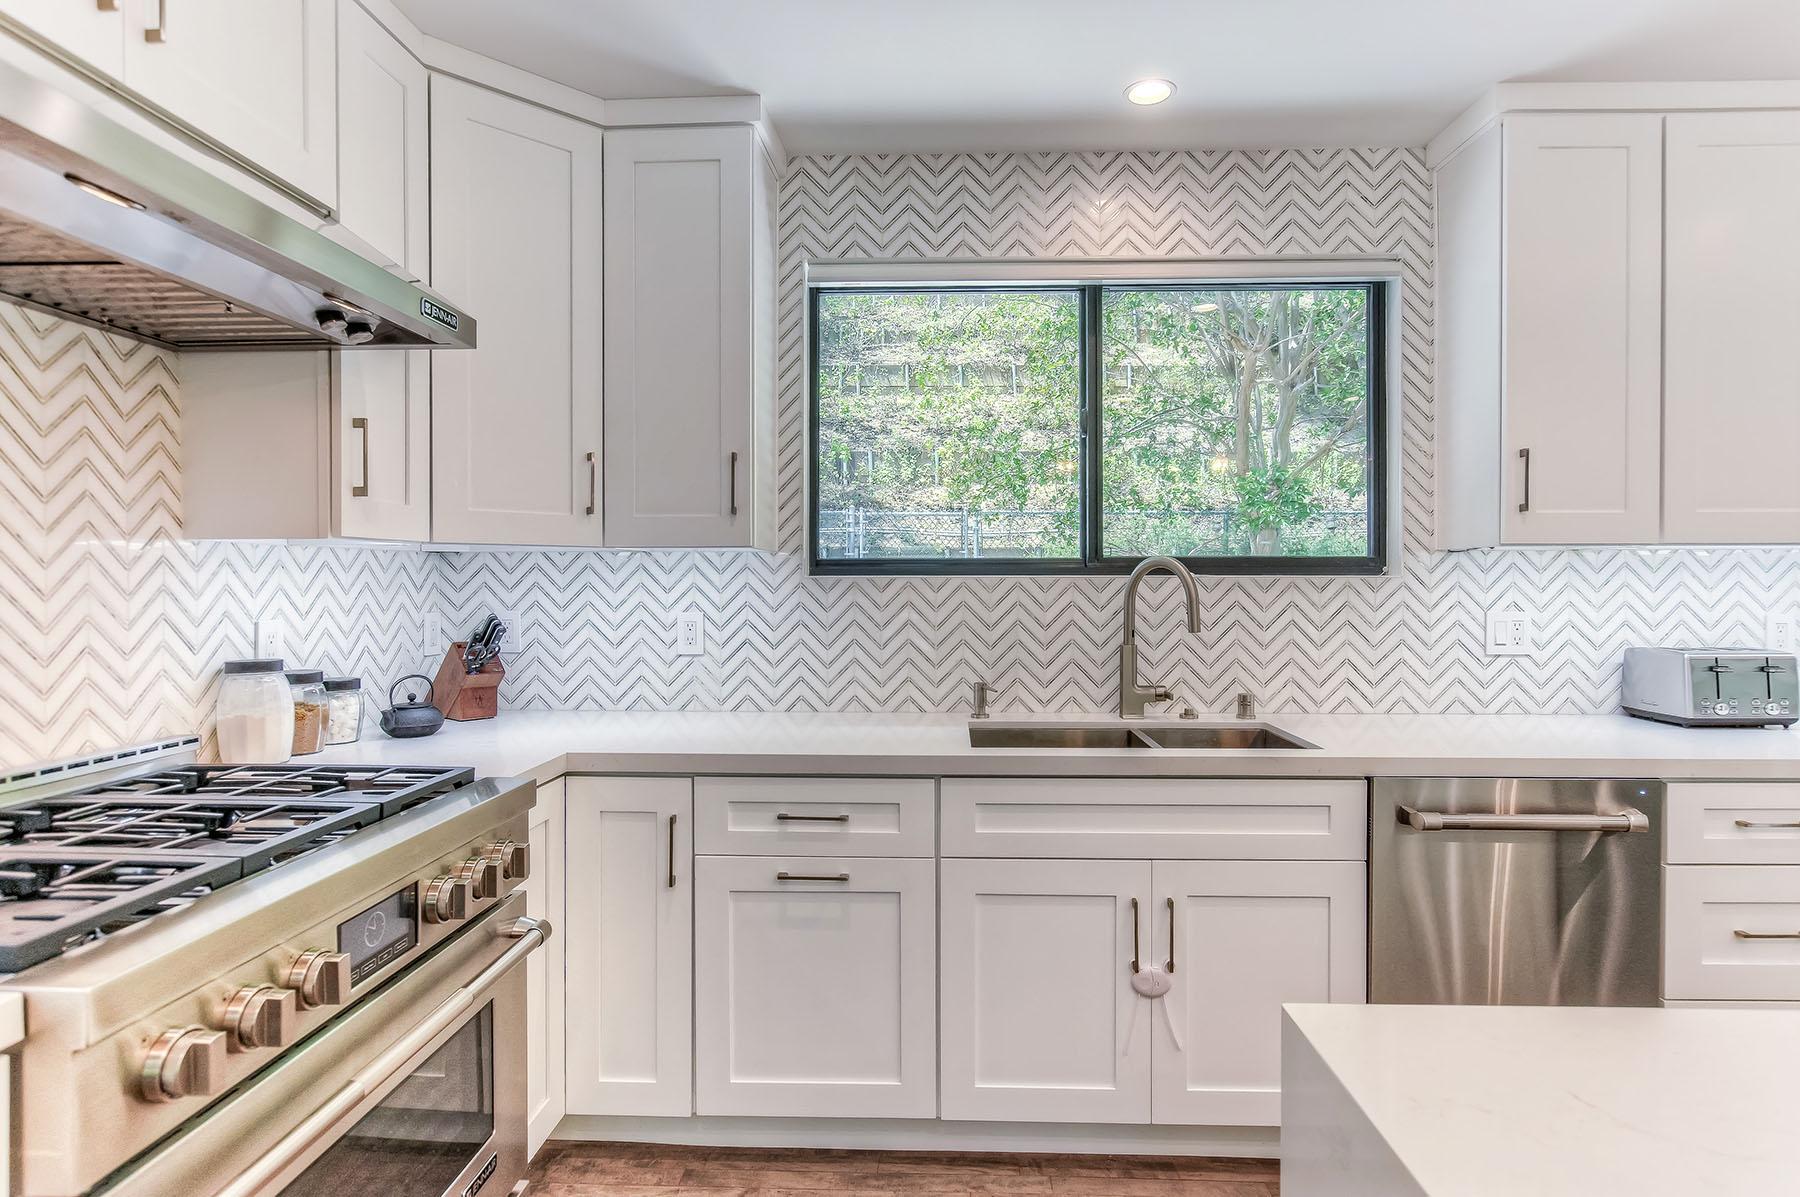 Studio City complete remodel kitchen small 3.jpg